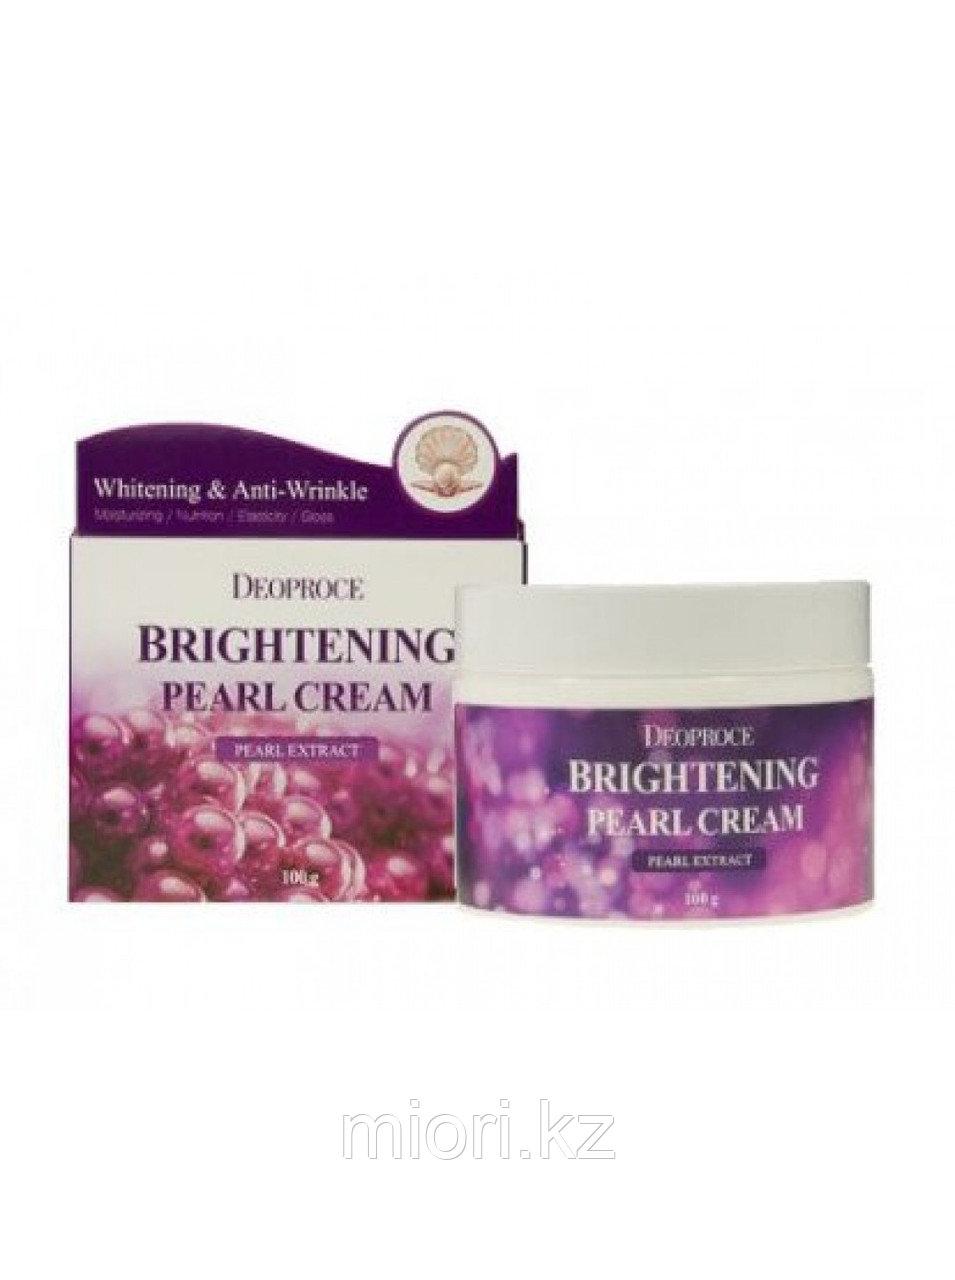 Brightening Pearl Cream [Deoproce]Увлажняющий крем с жемчугом для сияния кожи, 100гр